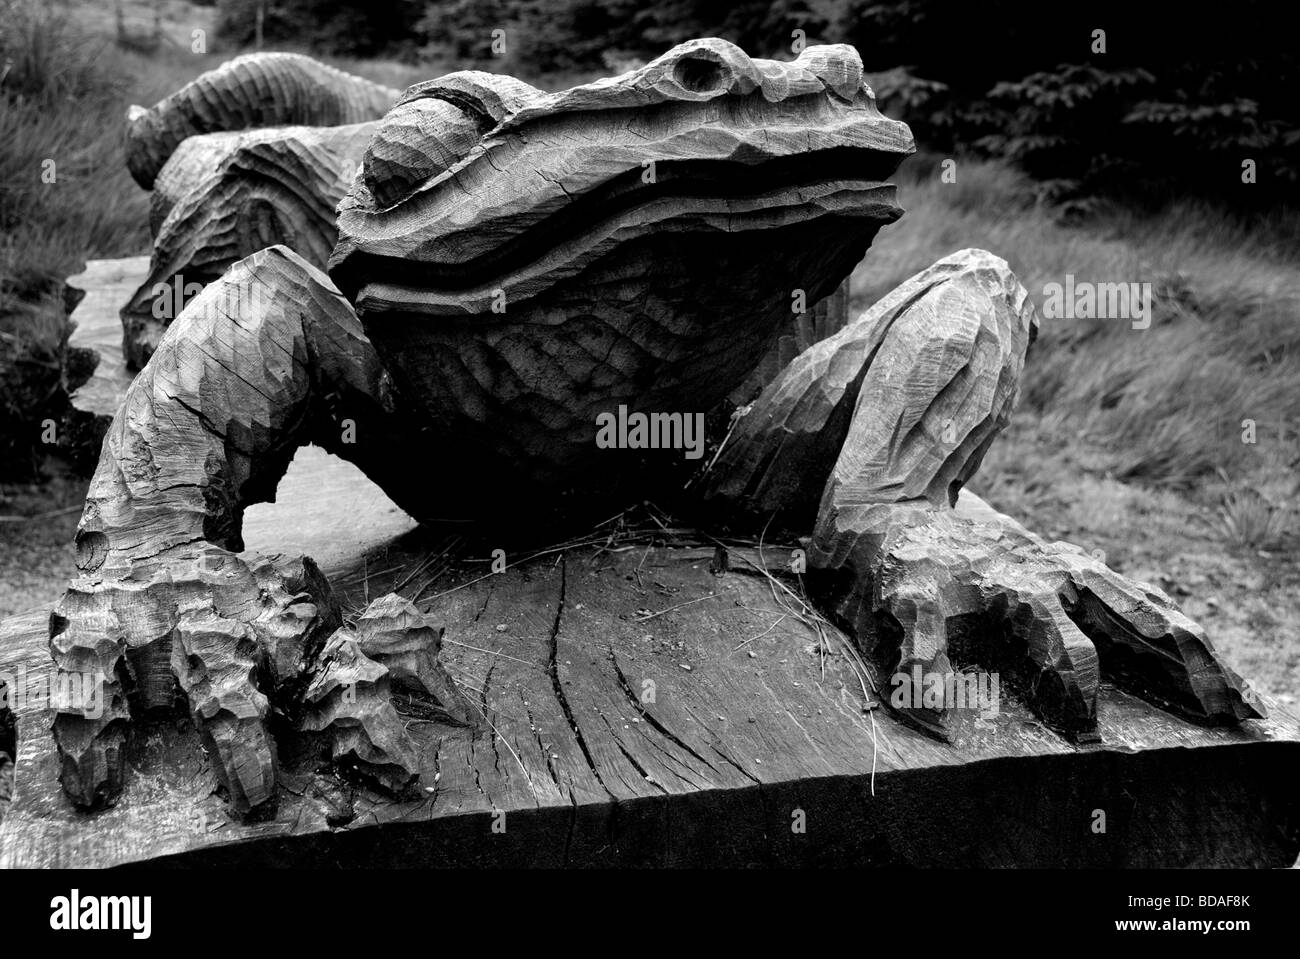 lizard carving, beacon fell - Stock Image